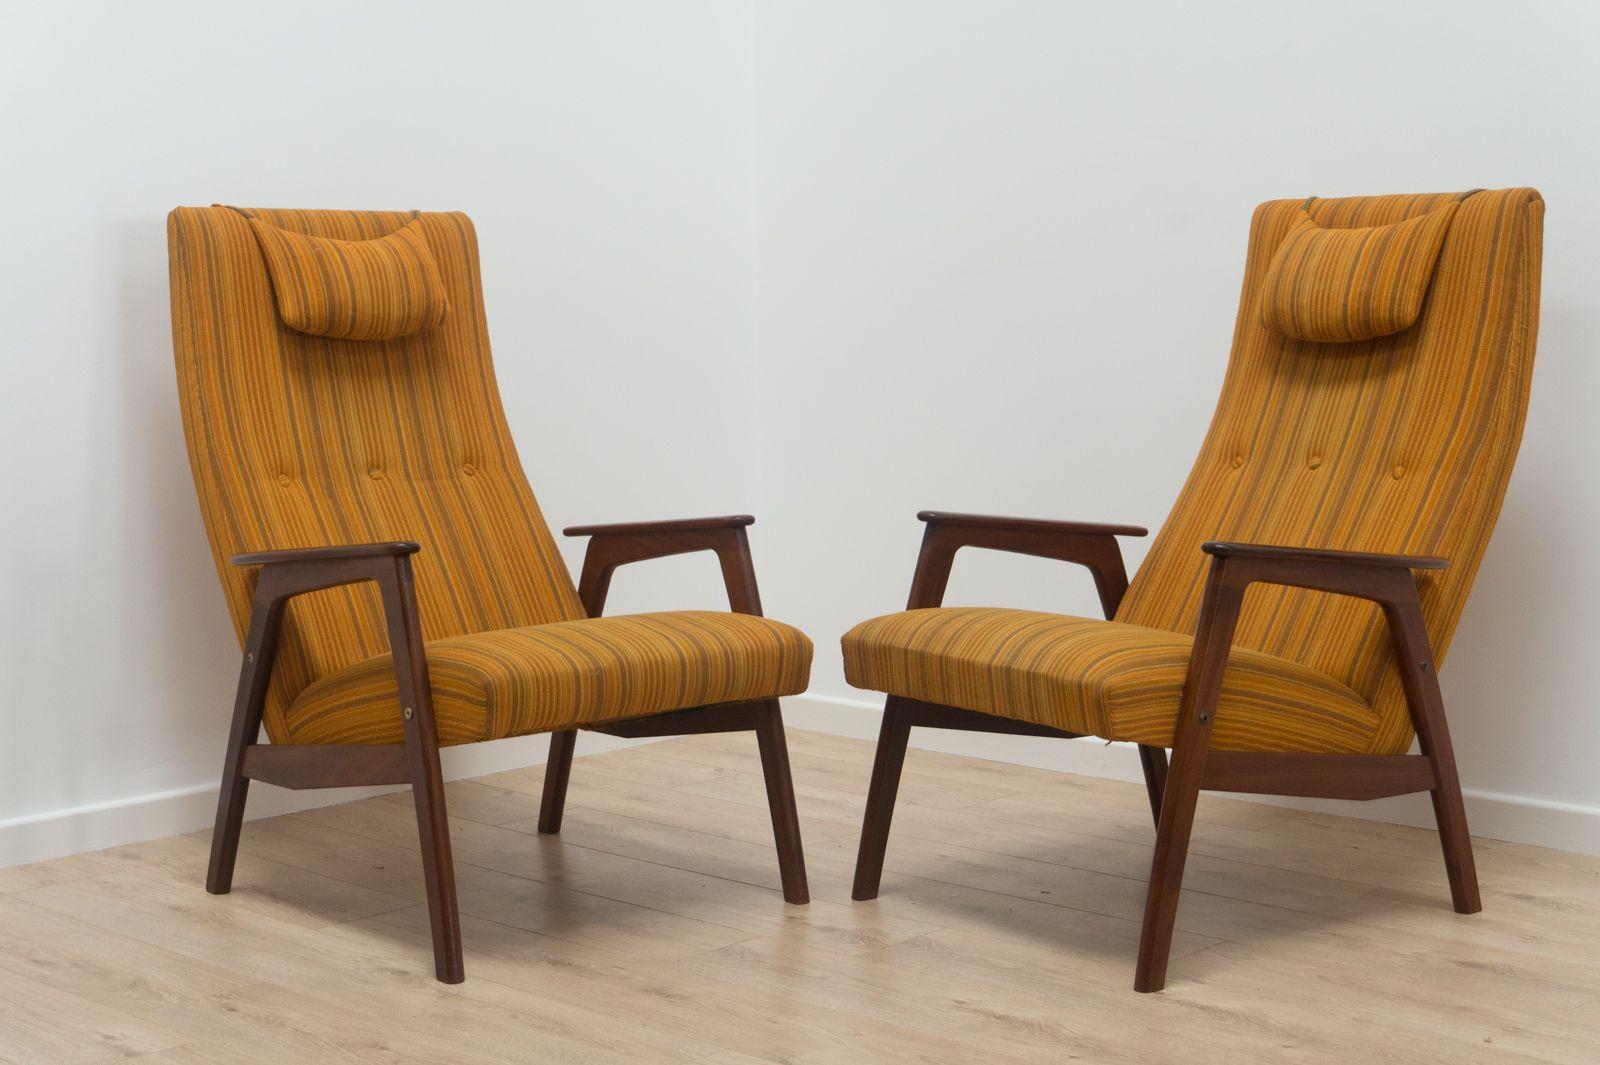 Dänische Mid-Century Palisander Sessel, 1950er, 2er Set